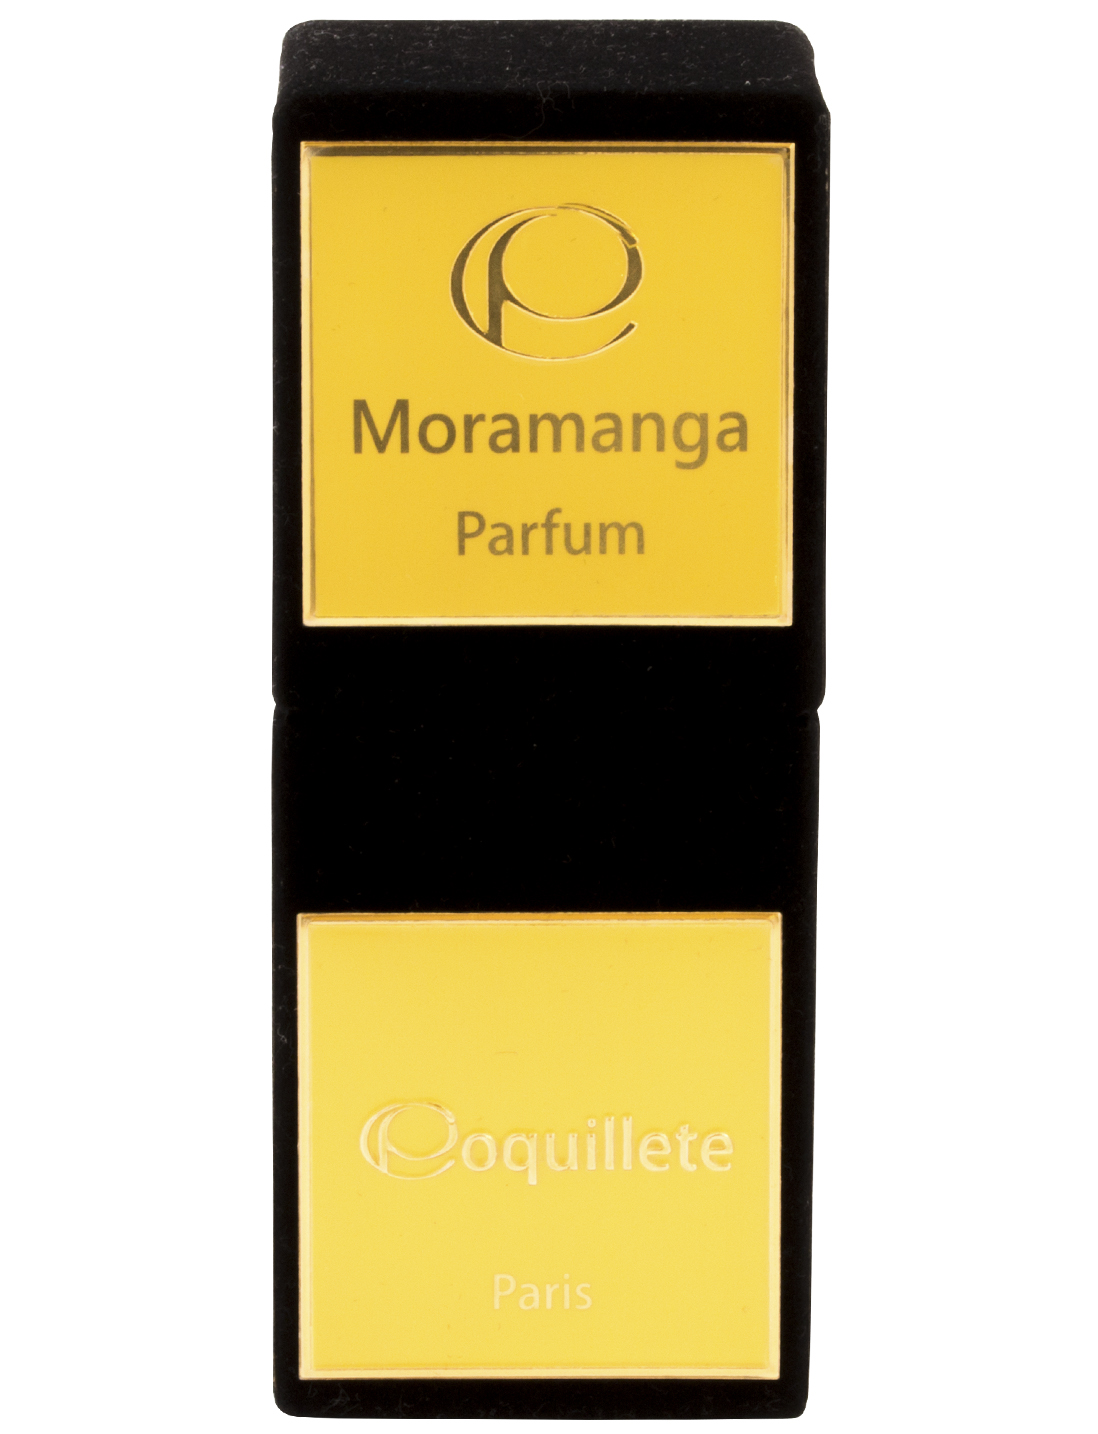 Moramanga